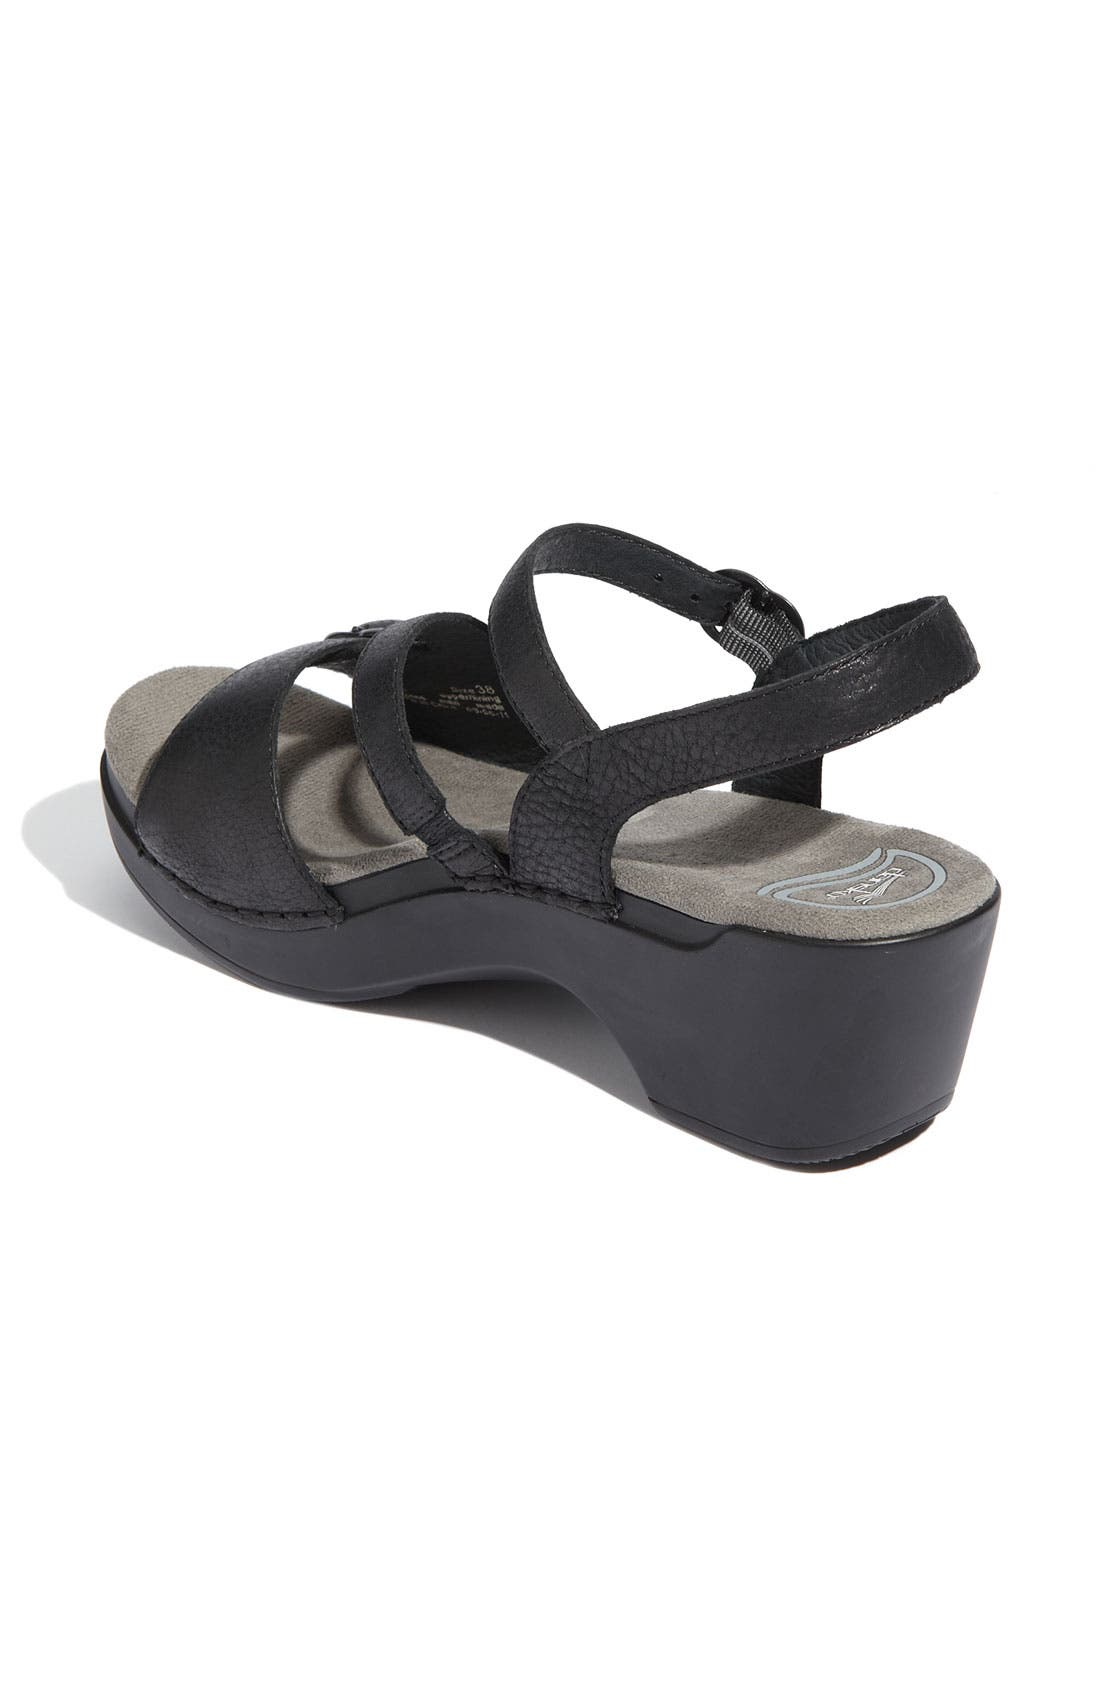 Alternate Image 2  - Dansko 'Sandi' Clog Sandal